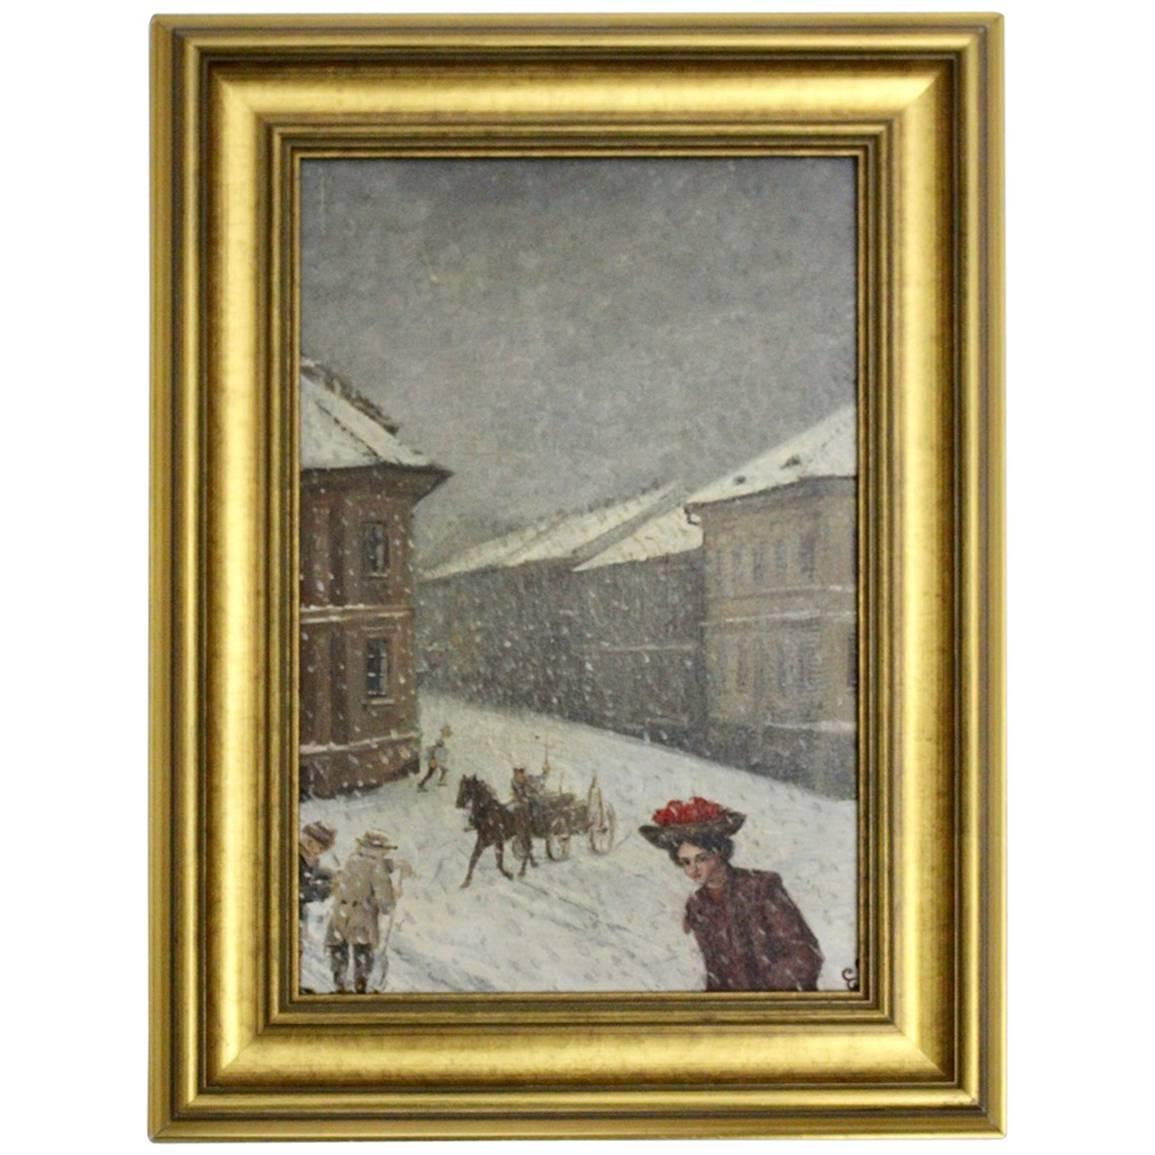 Jugendstil Painting Wintertime in Vienna by Emil Fiala, 1906